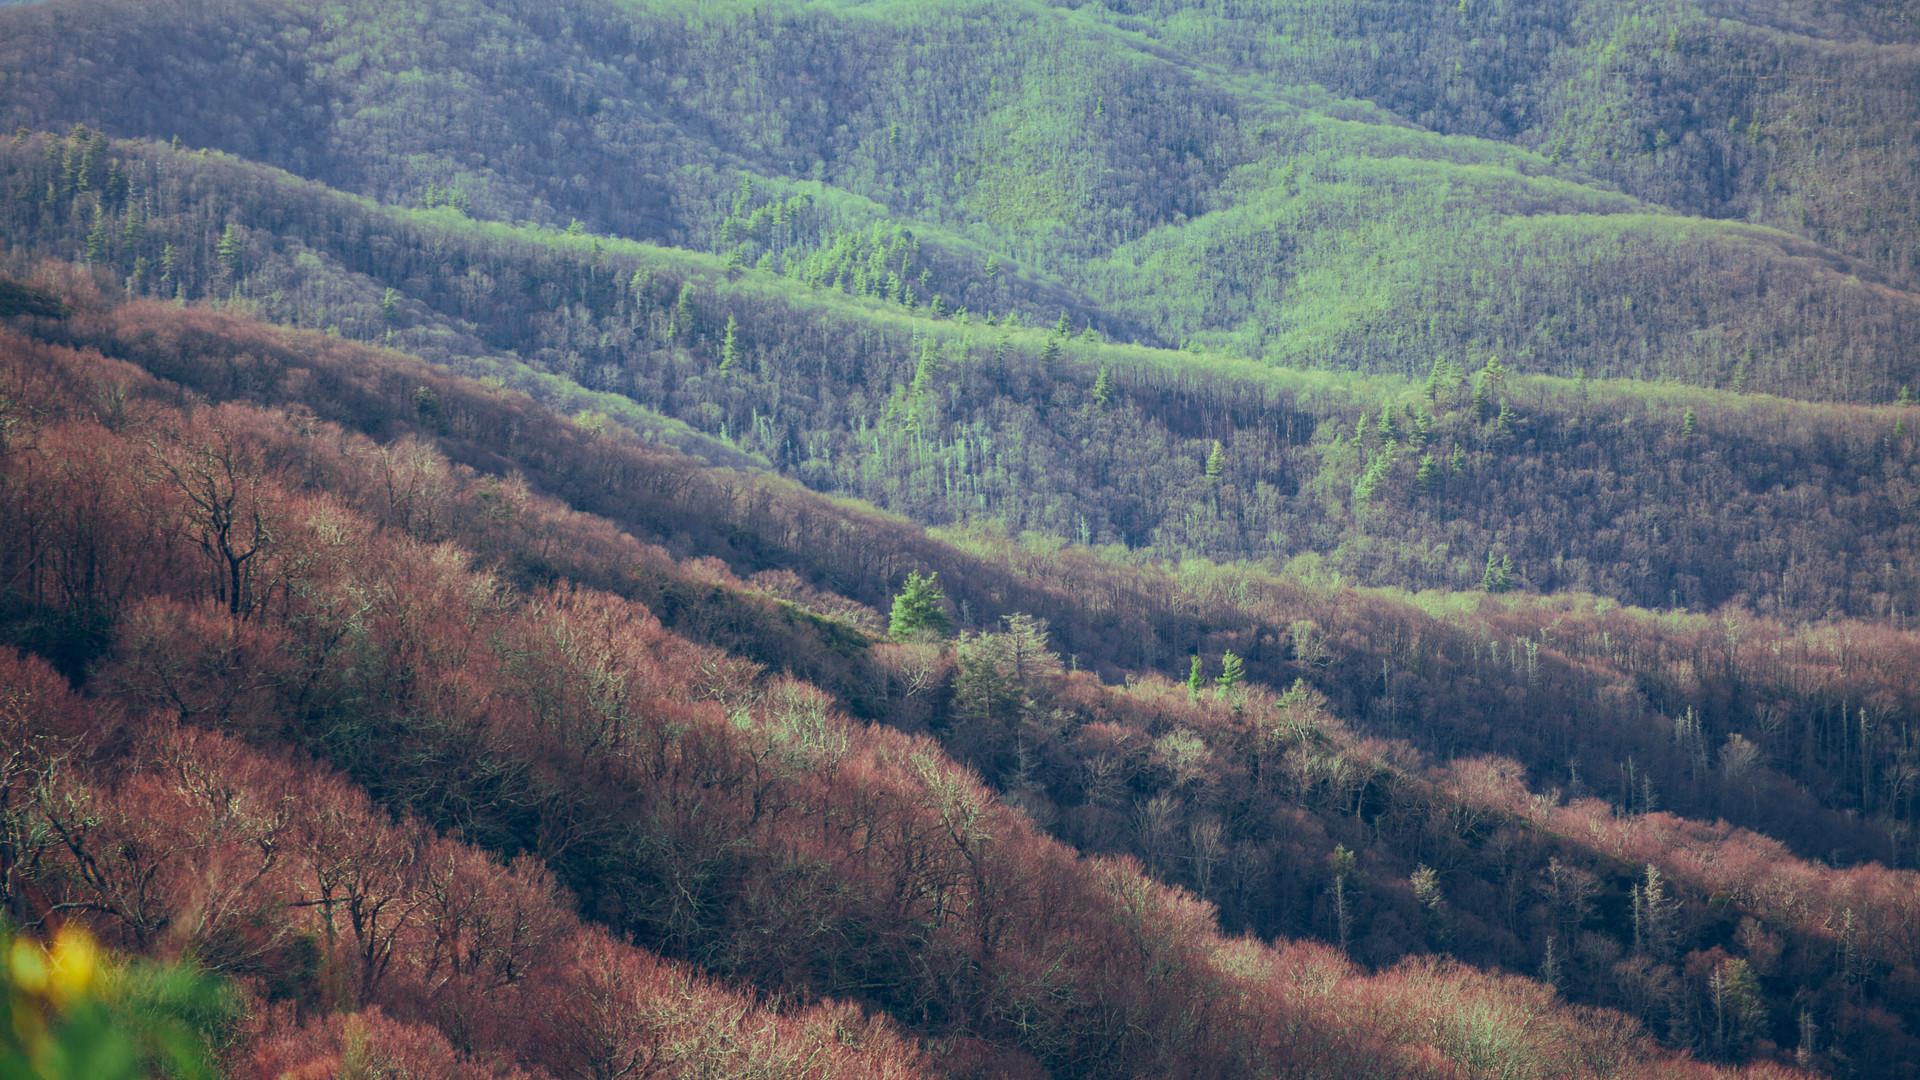 Round Knob to the Appalachian Trail